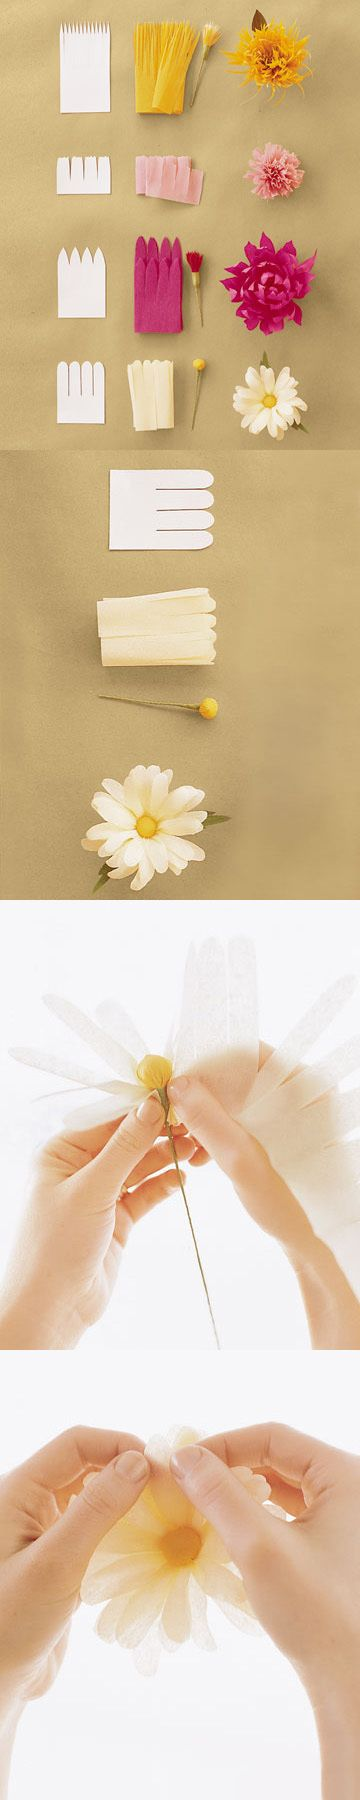 DIY: paper flower tutorials #paper_crafting #flowers